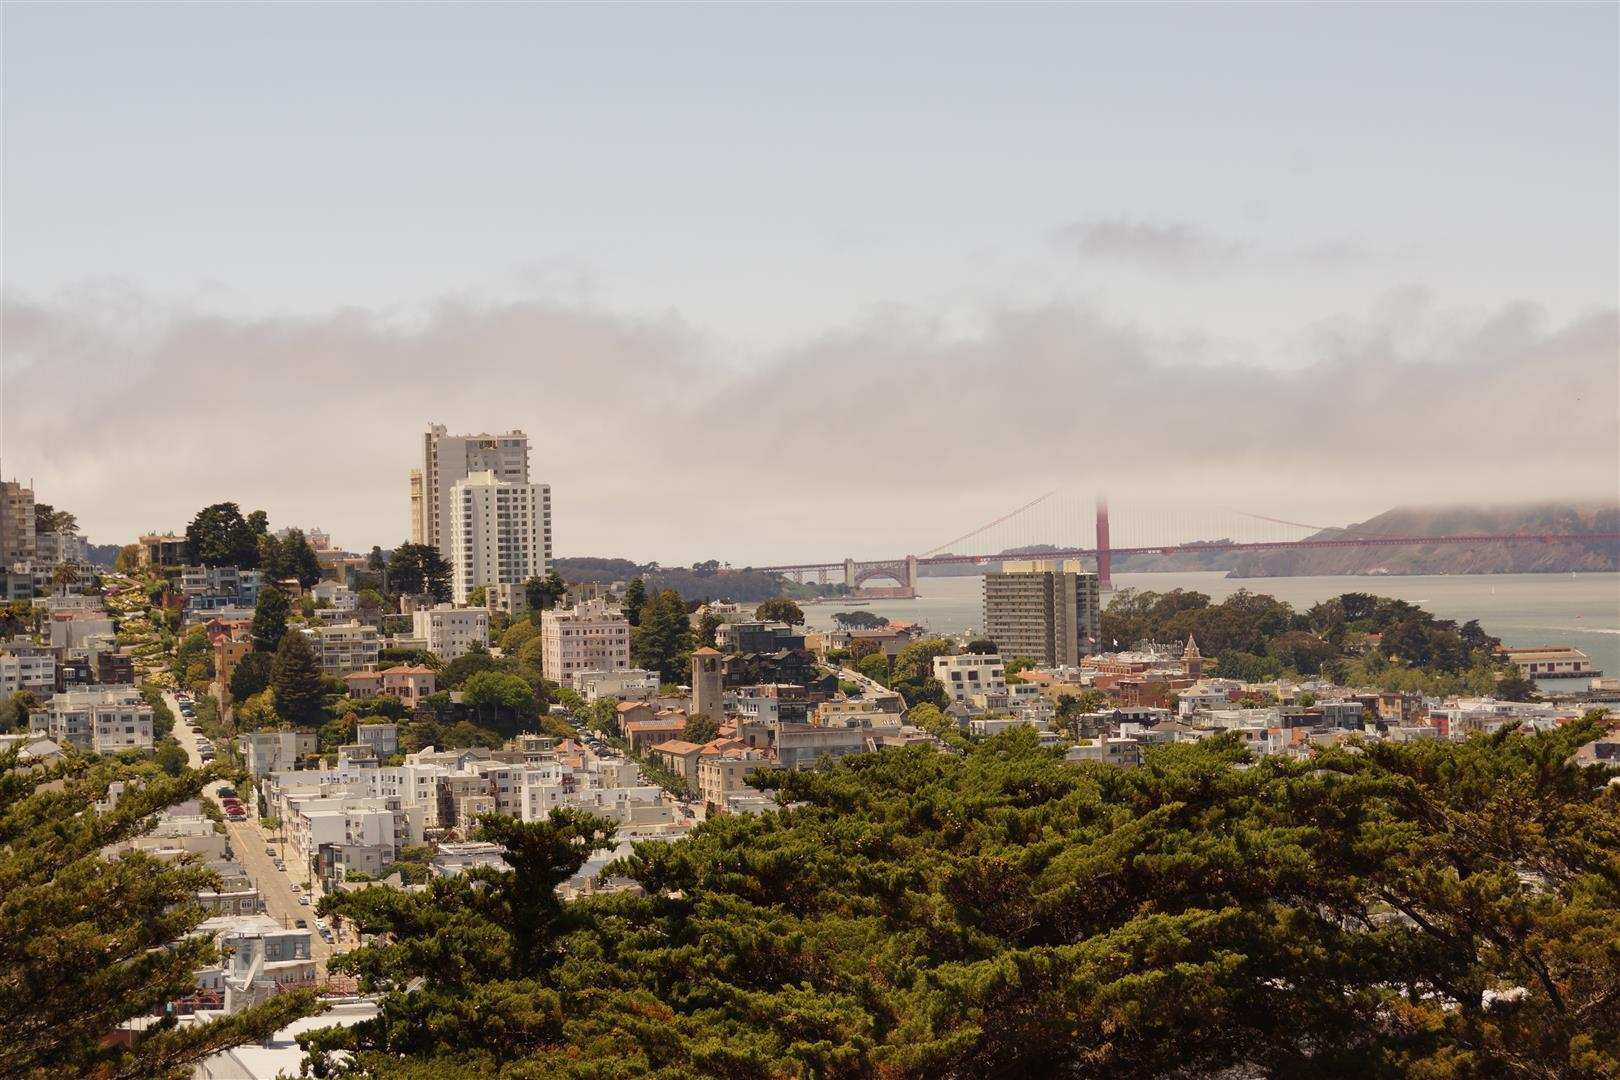 Links die Serpentinen, rechts (halb versteckt) die Golden Gate Bridge!